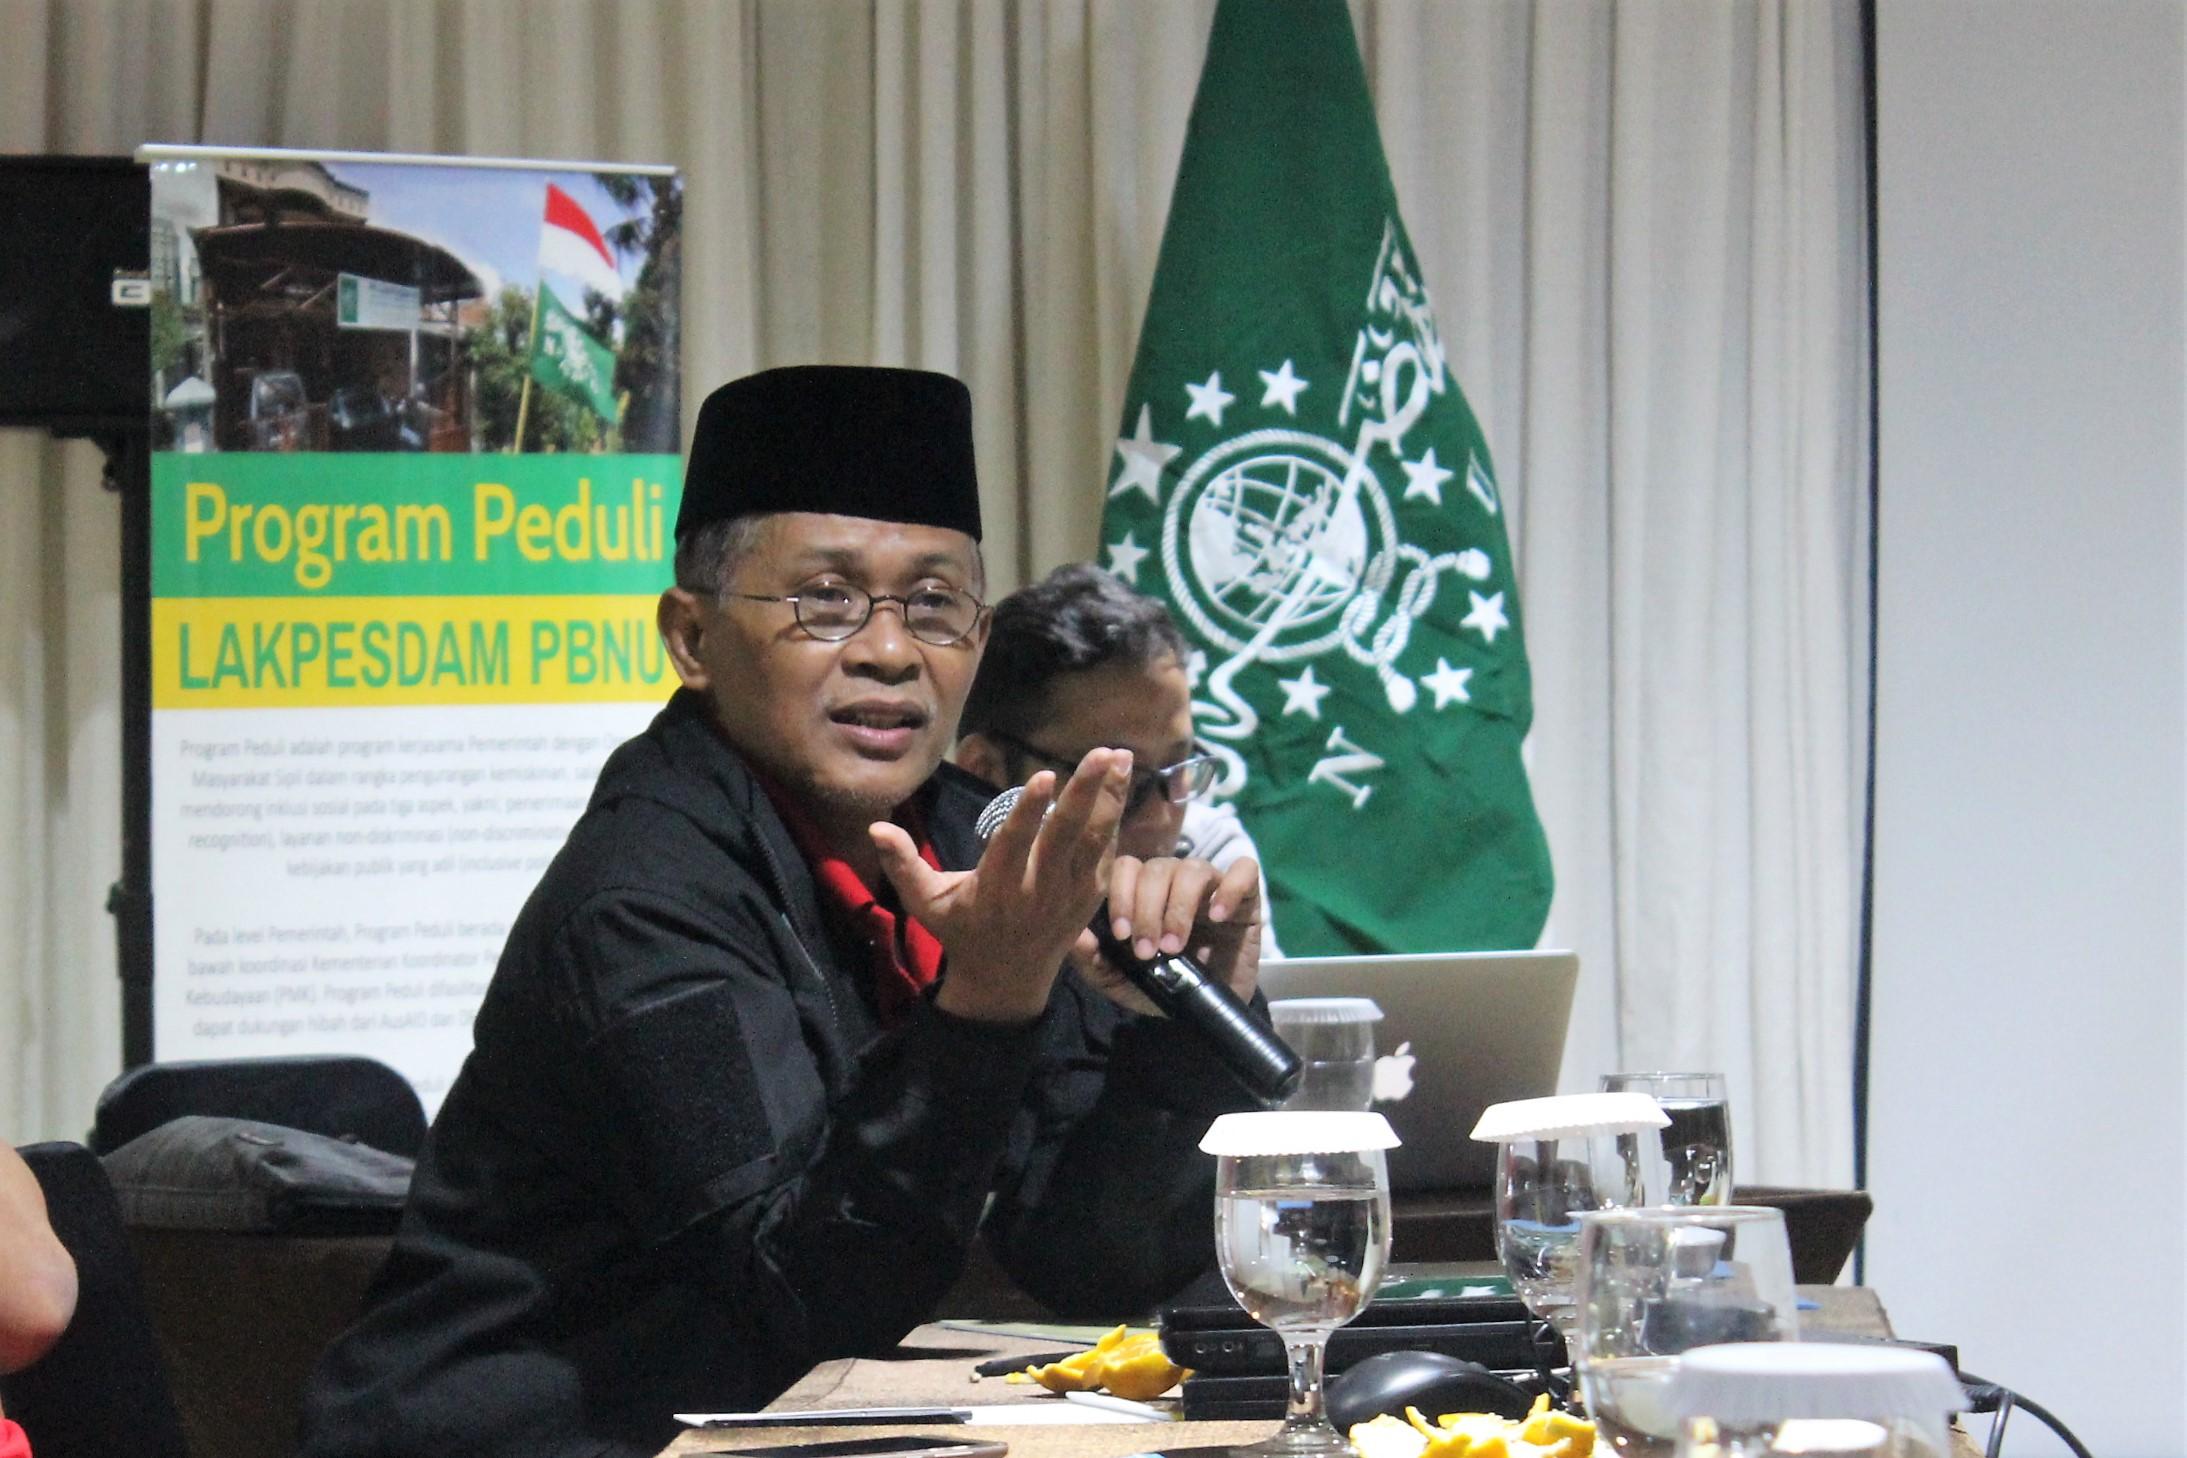 Perkuat Kampanye Inklusi Sosial, Lakpesdam PBNU Gelar Lokakarya Media